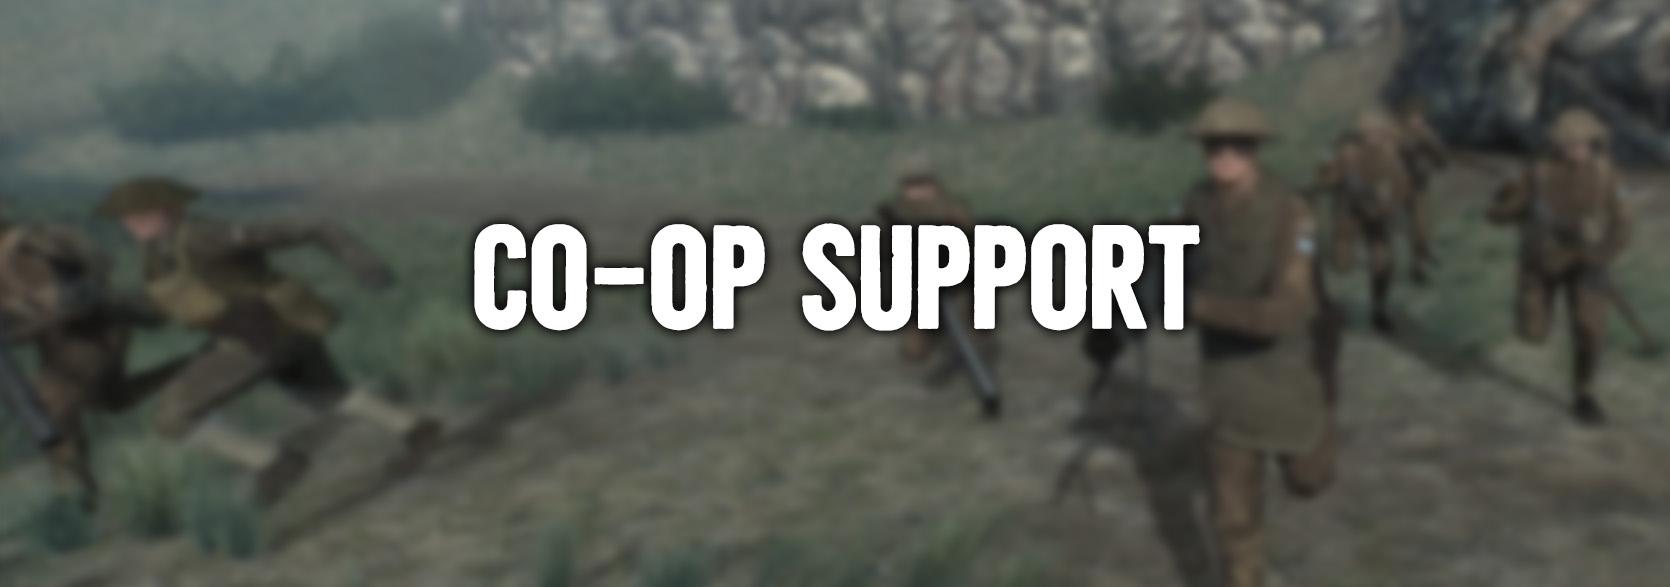 coop support2